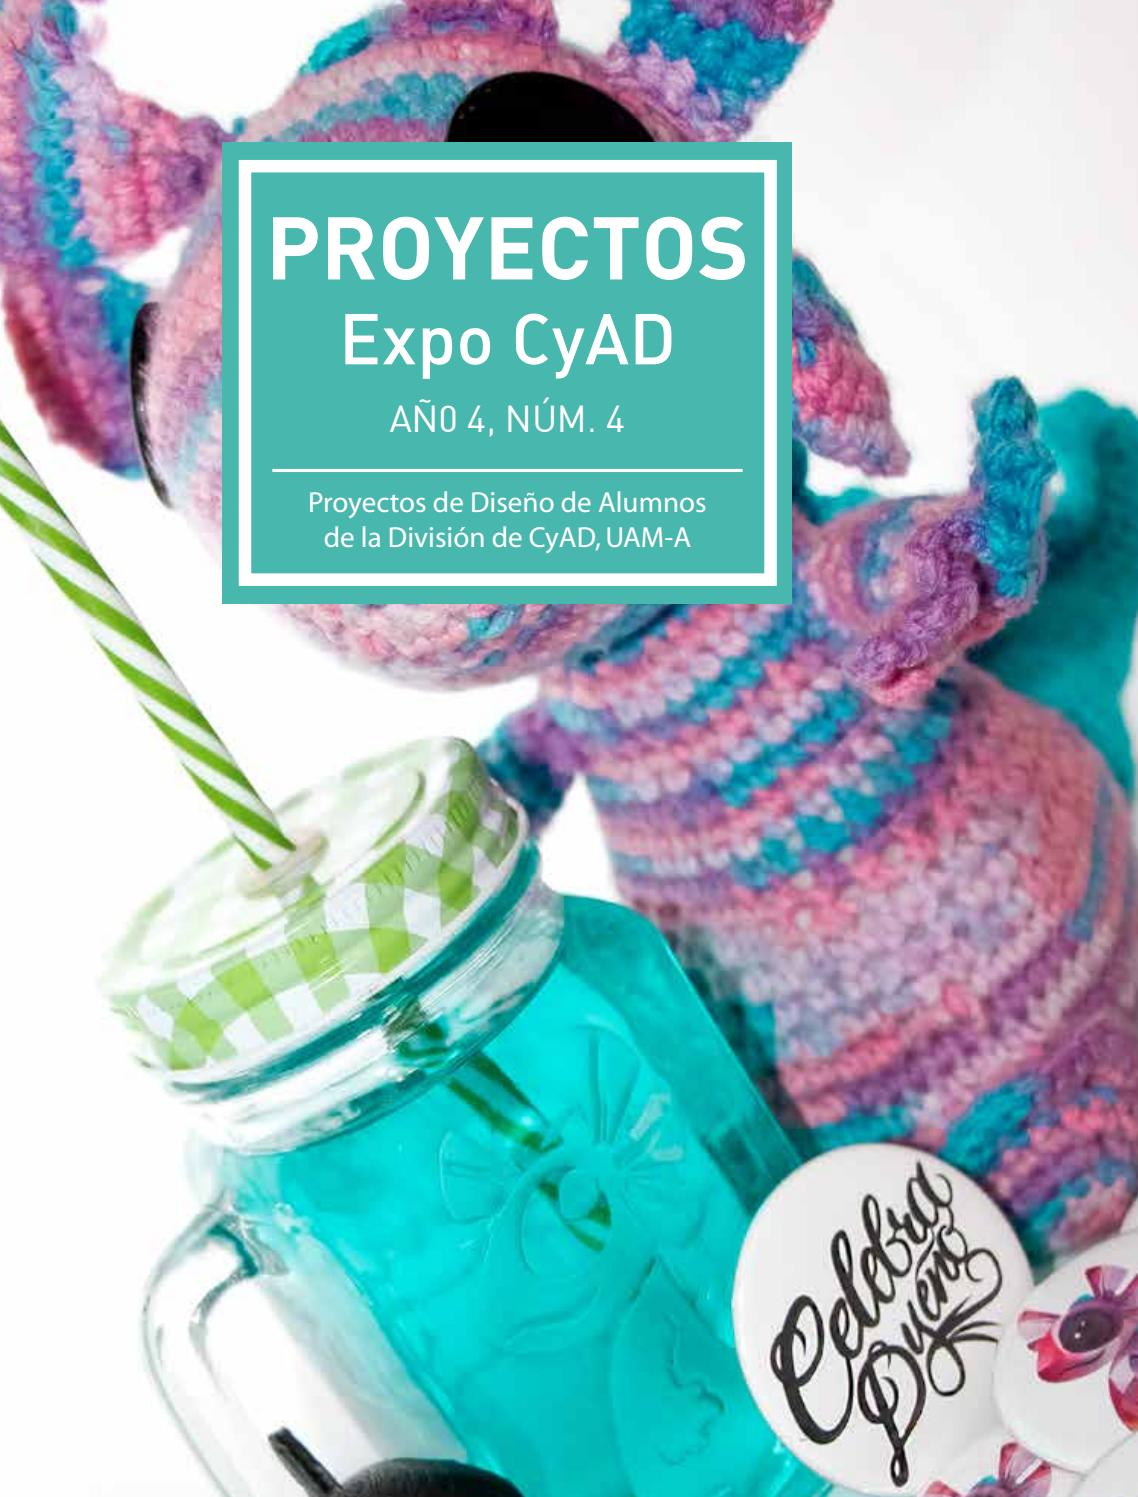 Proyectos Expo CyAD by CyAD-A - issuu